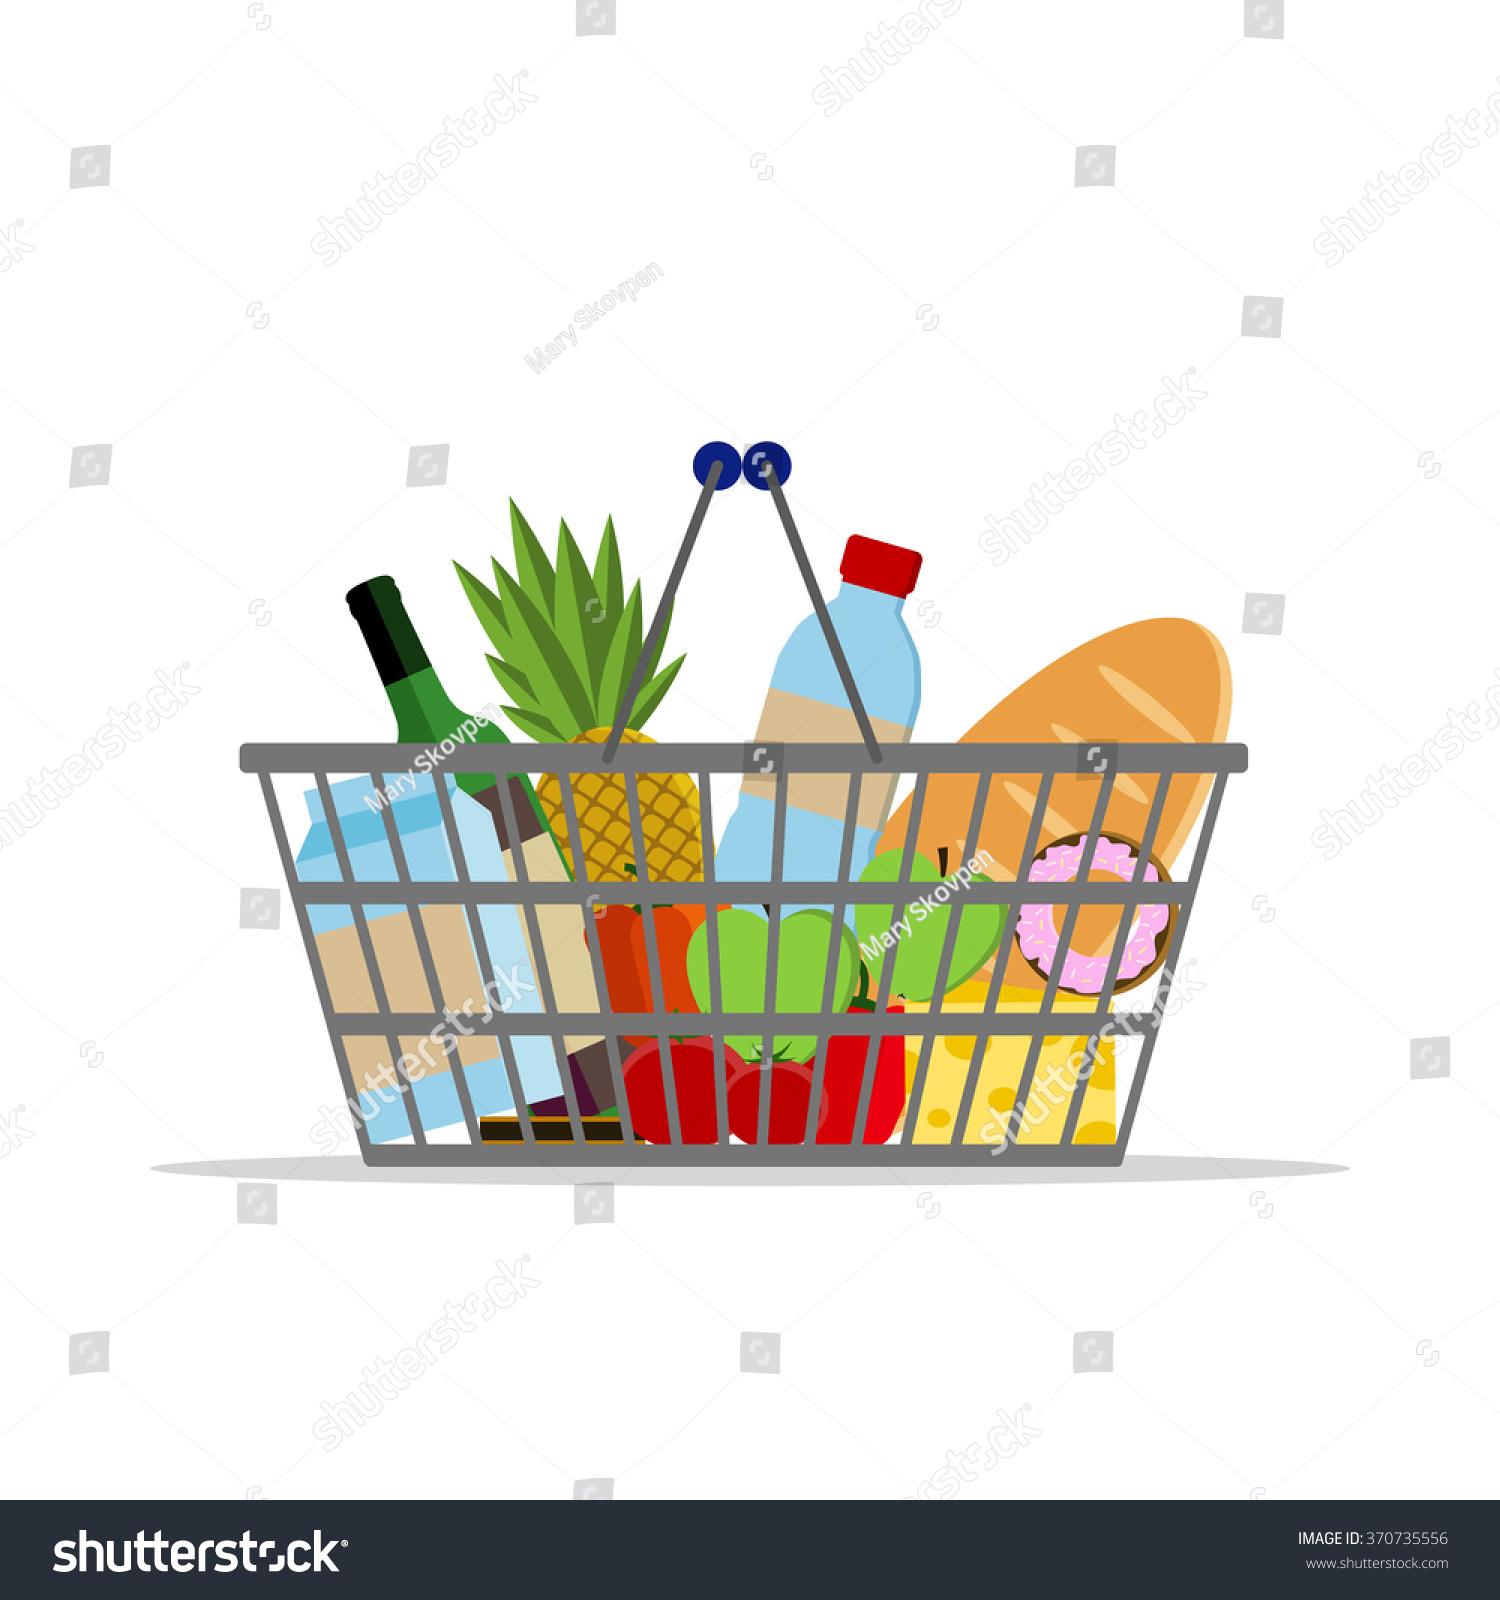 Organic Food Supermarket Logo: Full Basket Different Food Supermarket Shopping Stock